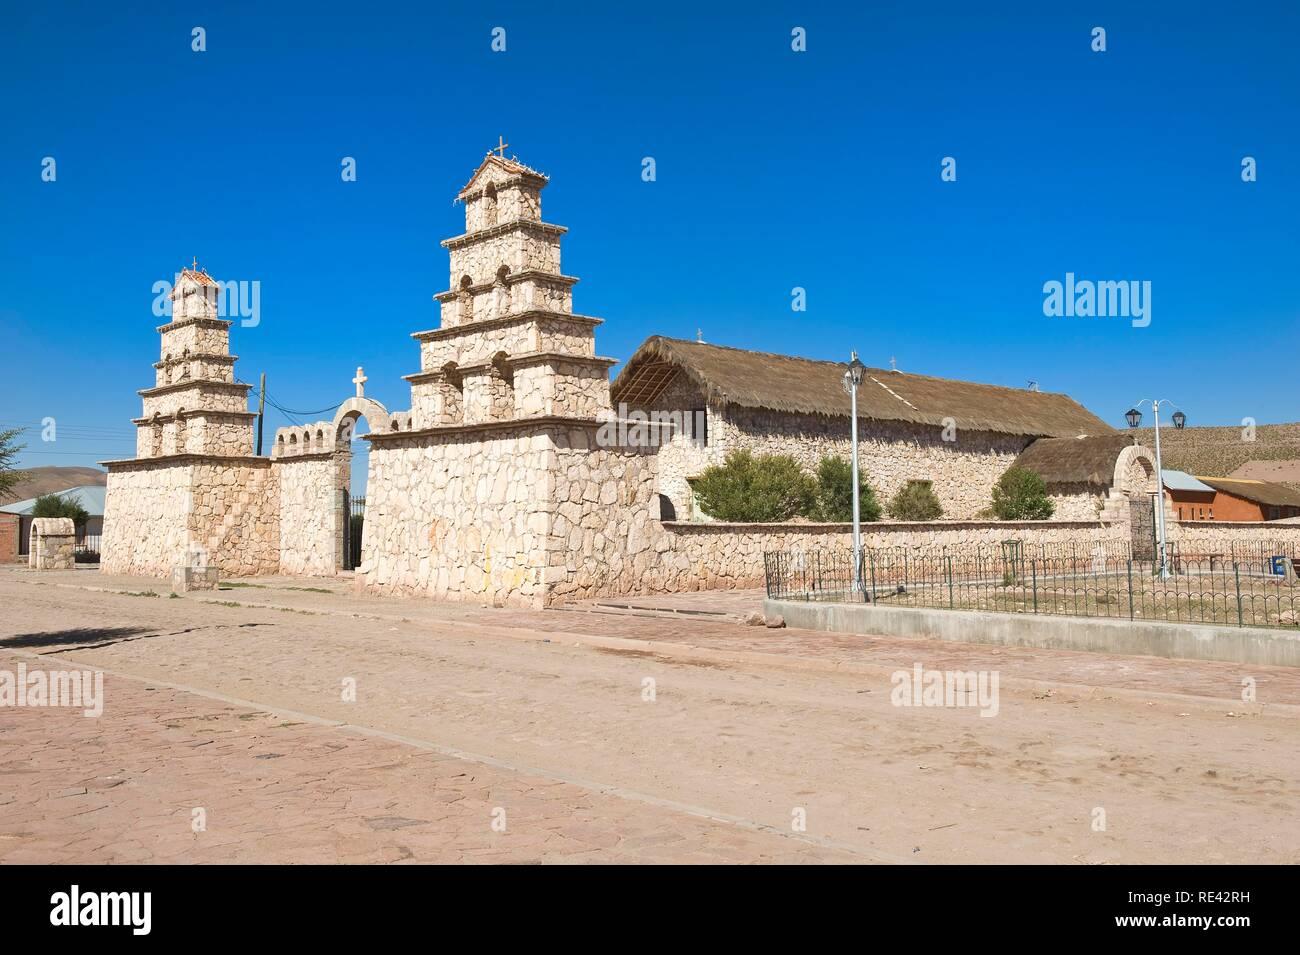 17th century church, San Cristobal, Altiplano, Potosi, Bolivia, South America - Stock Image